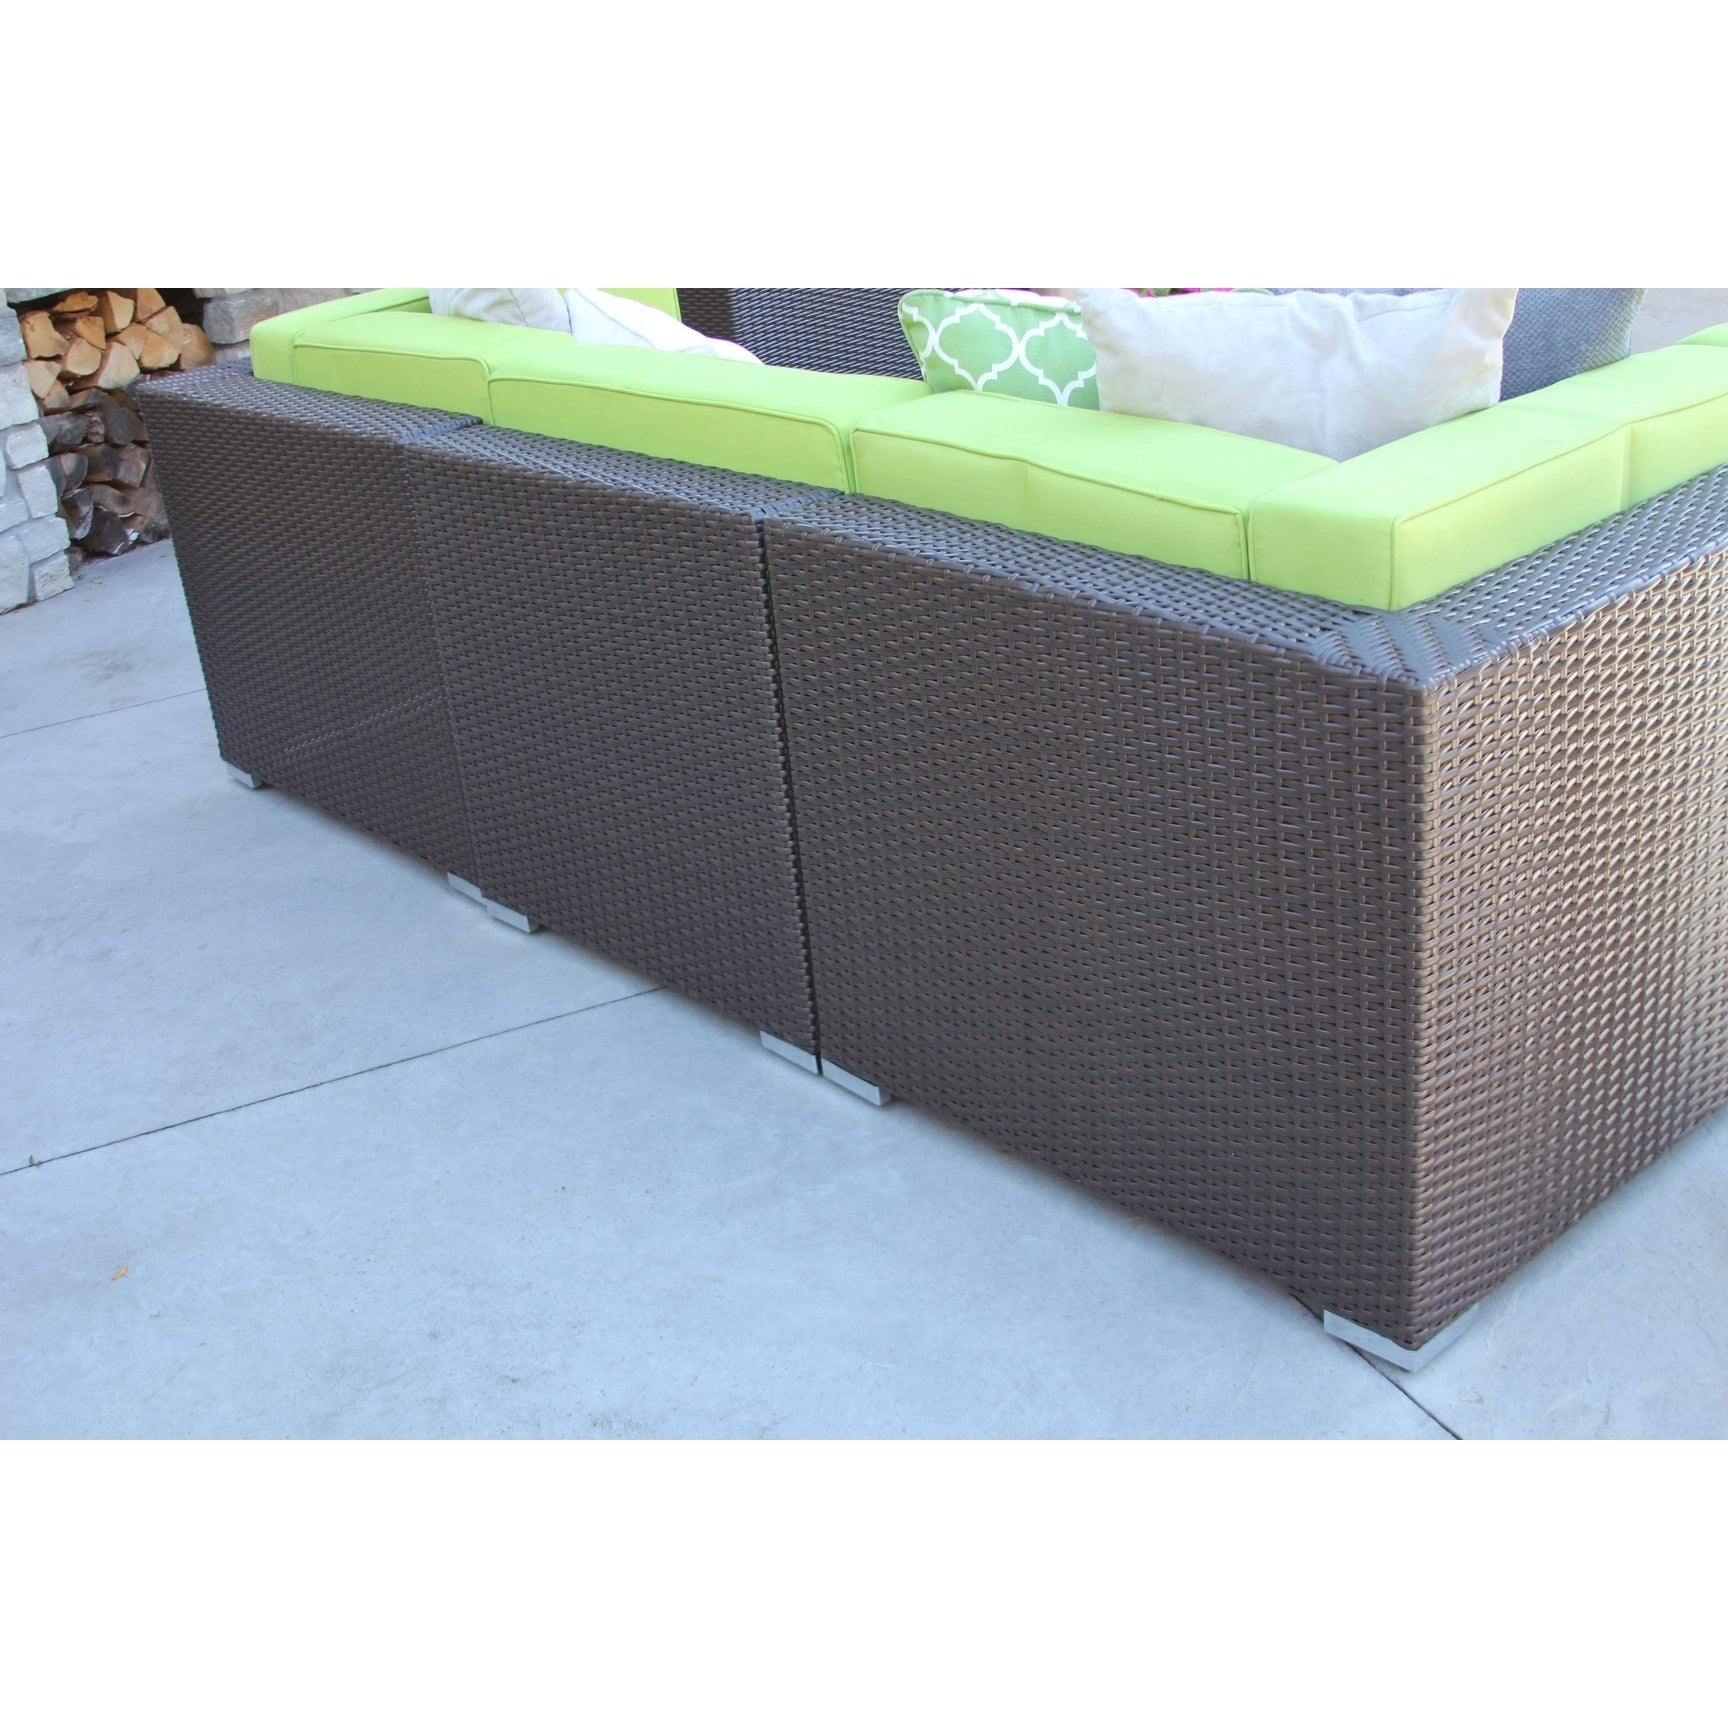 Details About Dupont 7 Pc Modern Outdoor Rattan Patio Furniture Sofa Set Modular